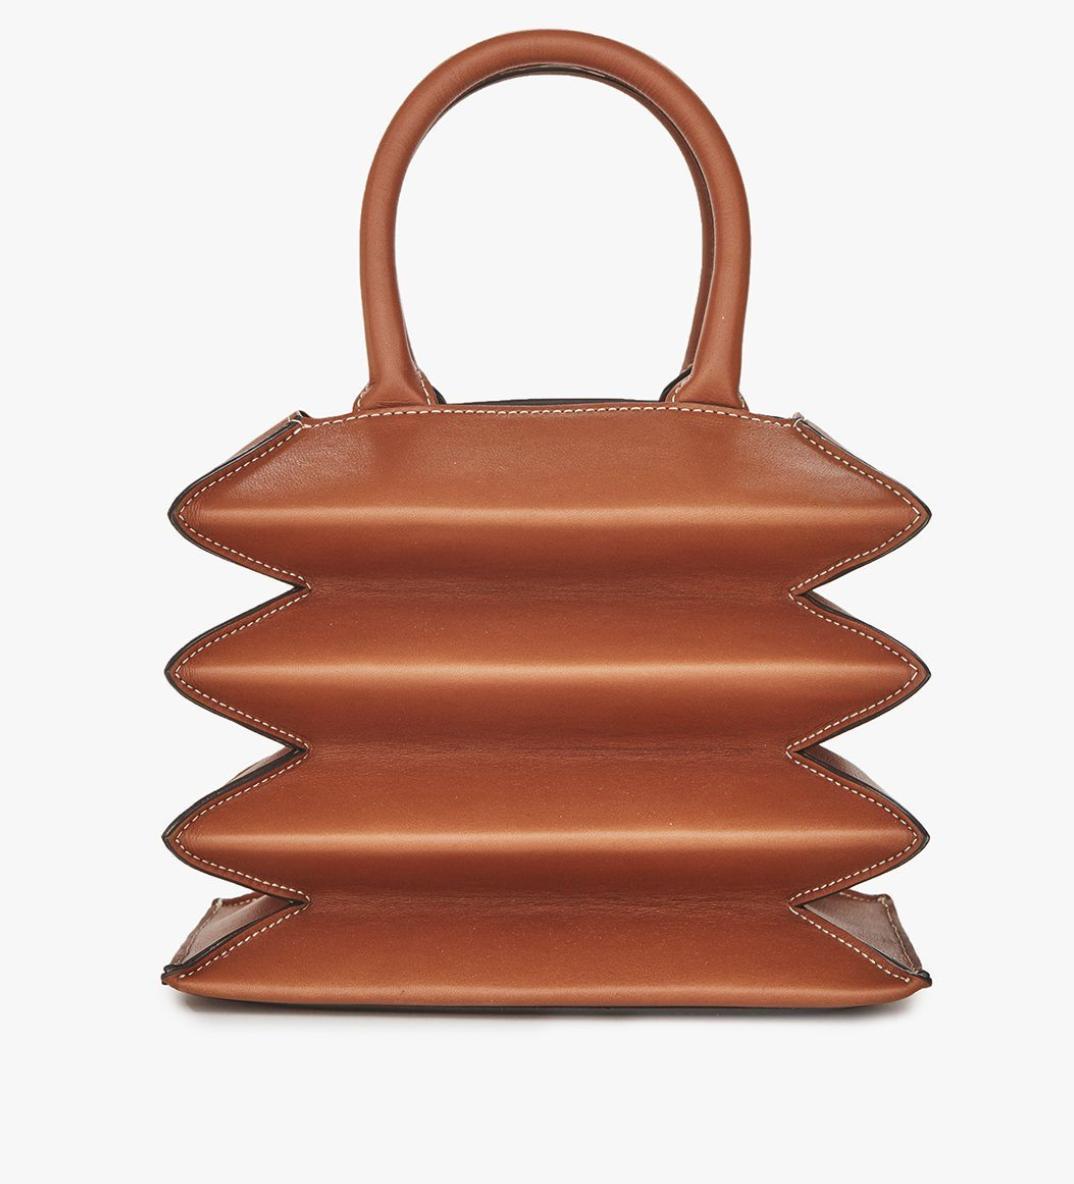 - THE HUTTON BAG